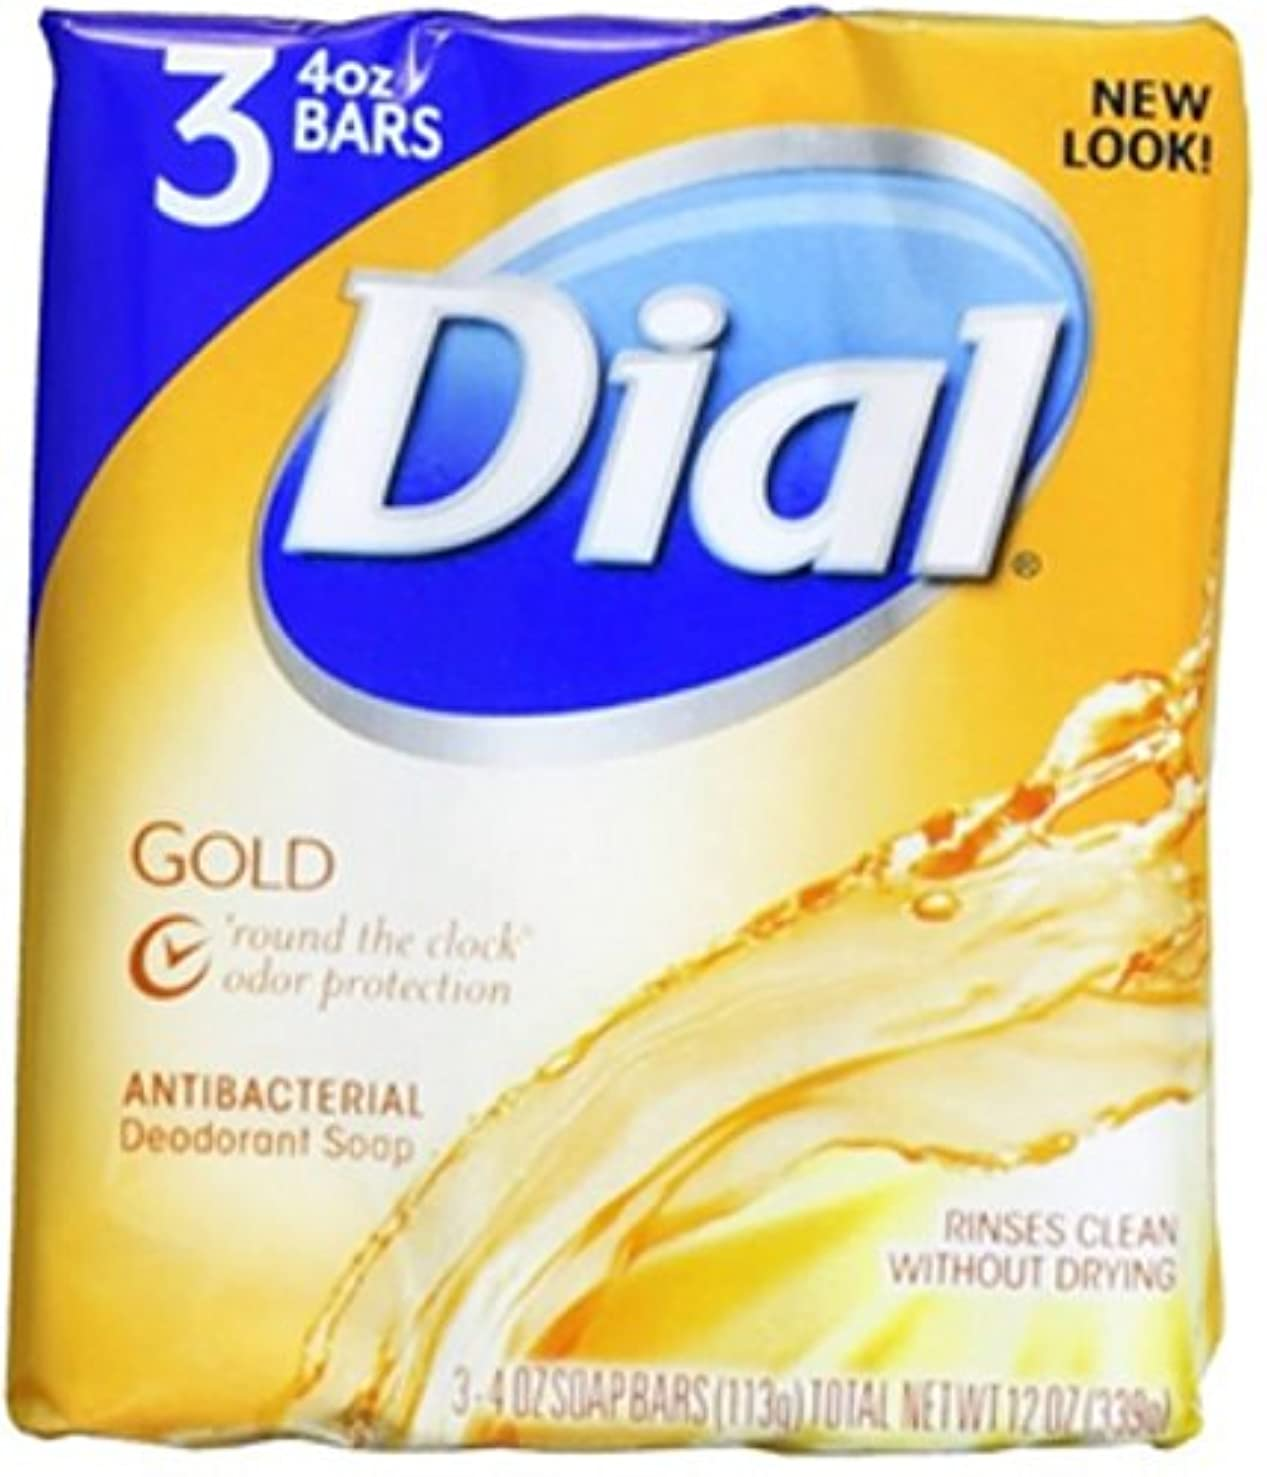 Dial 抗菌消臭石鹸バー、ゴールド、4つのオズバー、3 Eaは(6パック)